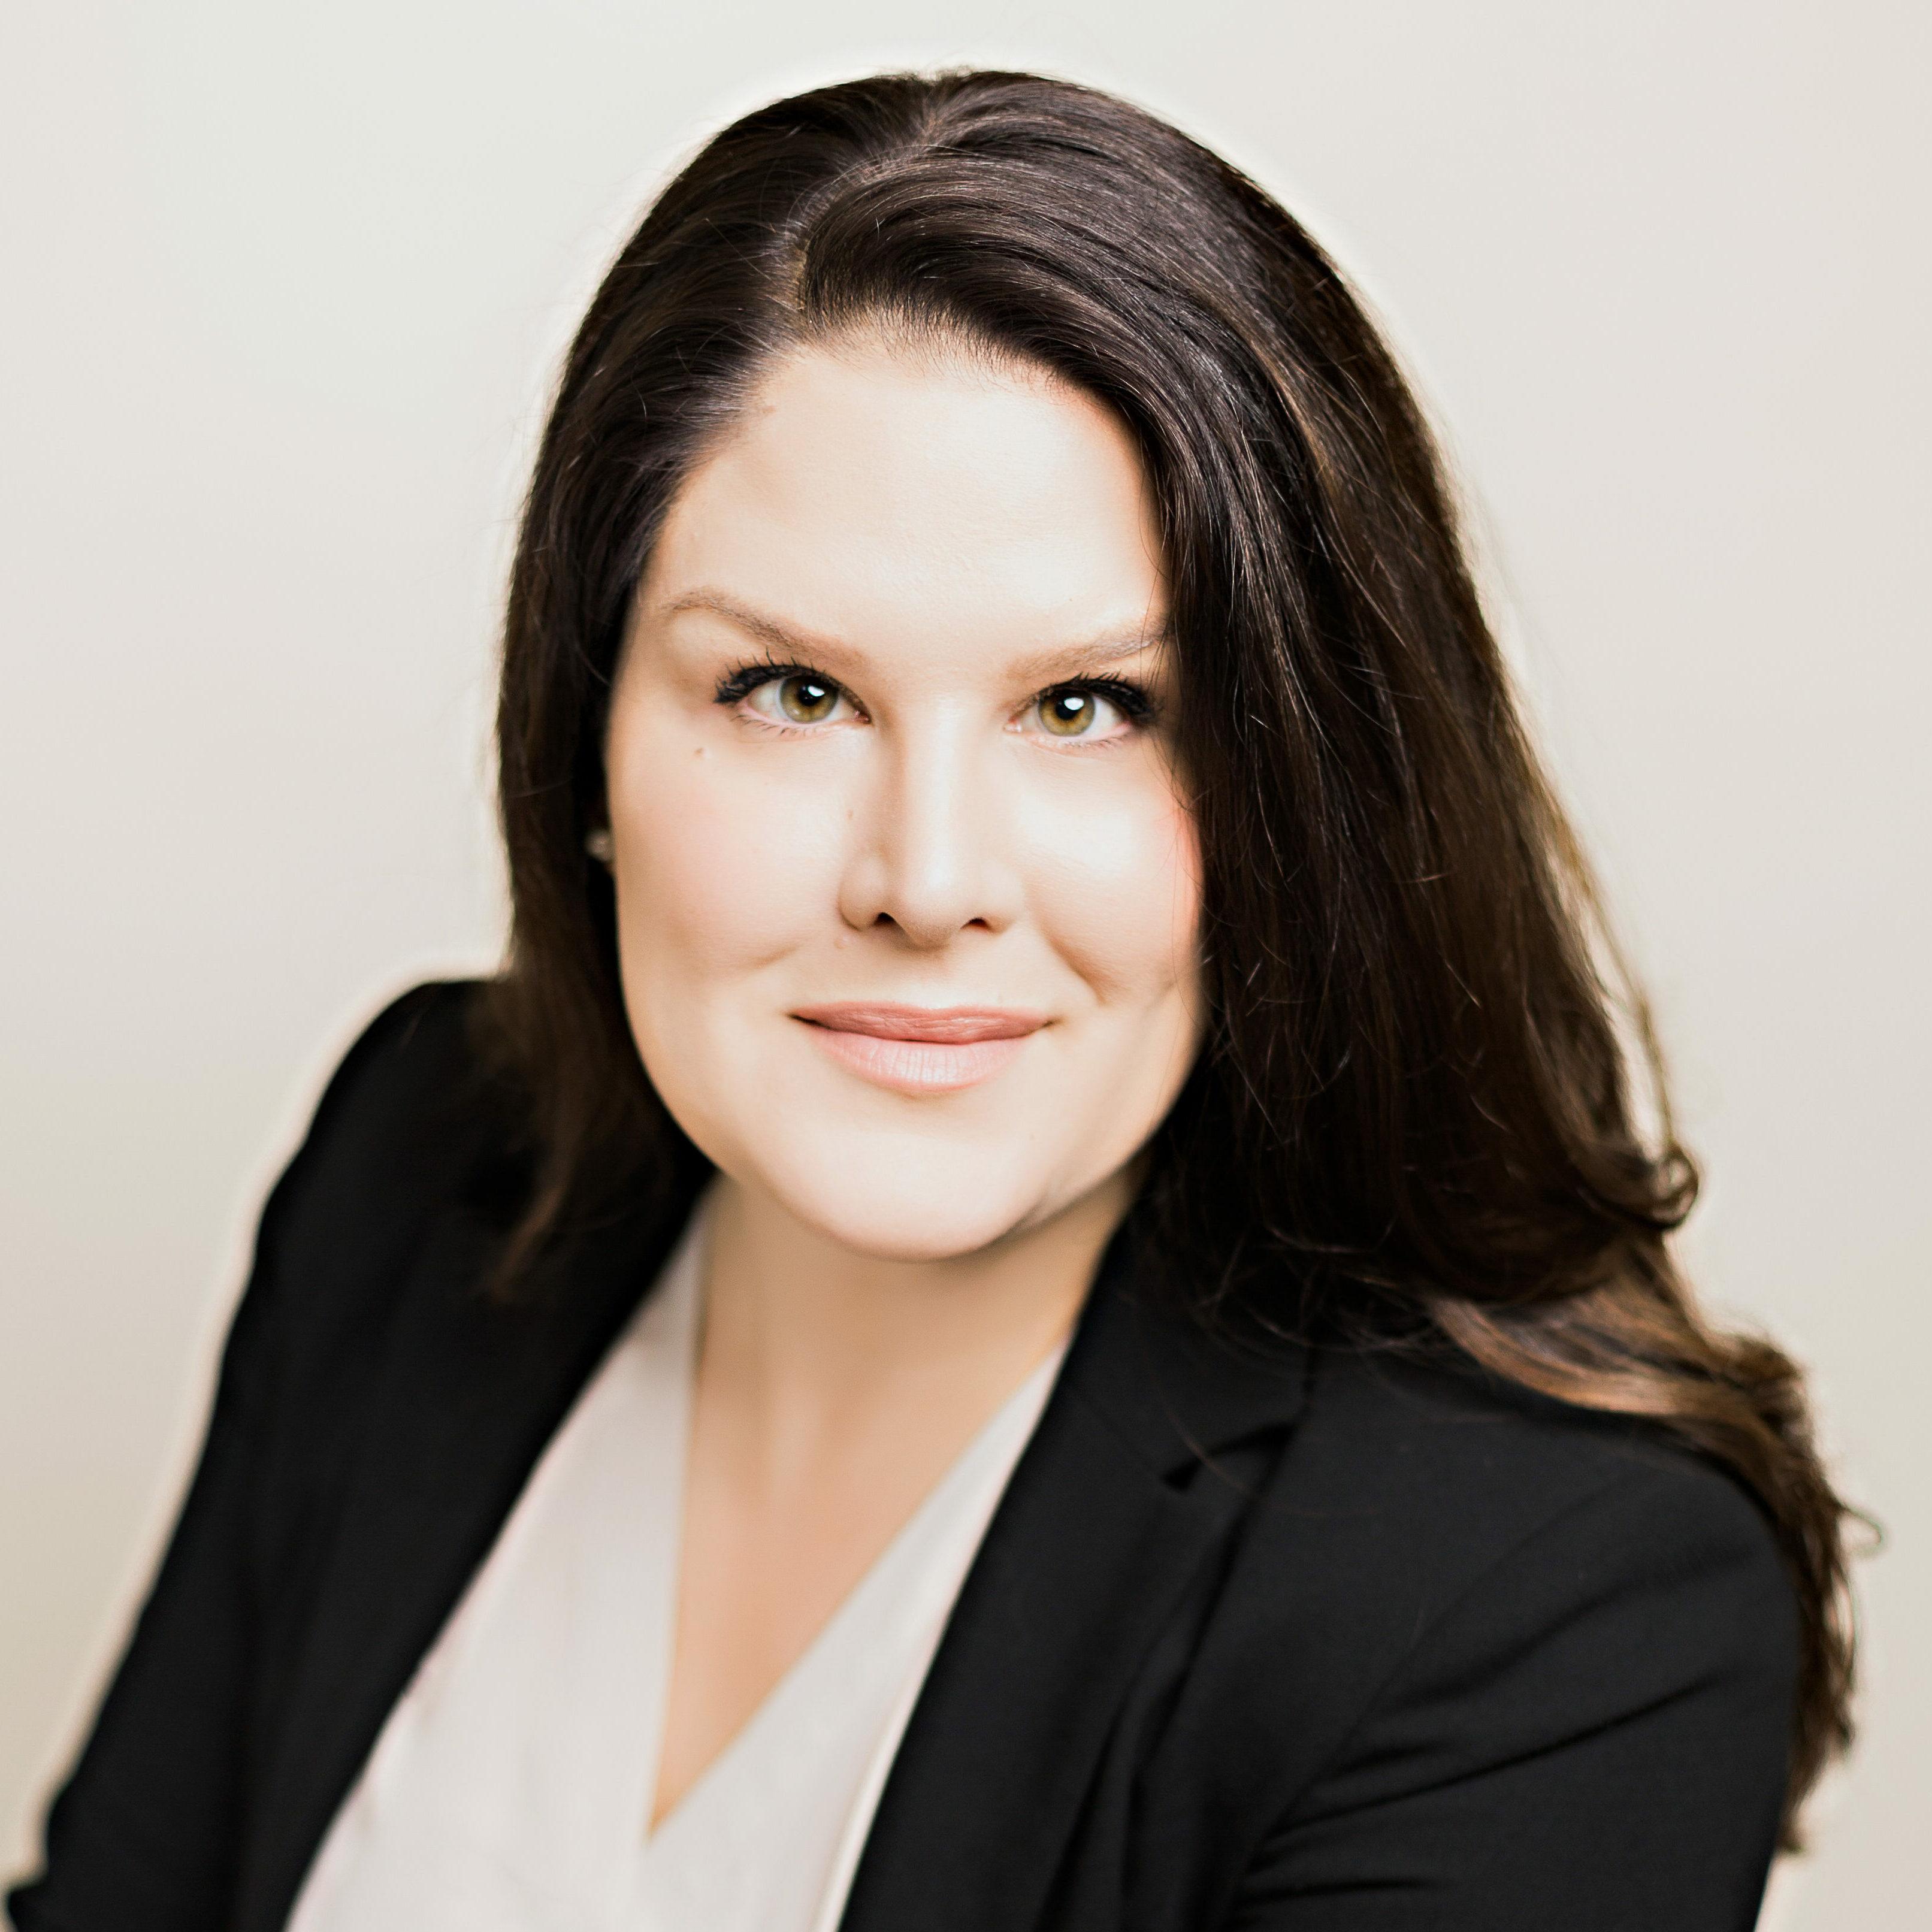 Ann Pannell, founder of Clarity Speech Coaching